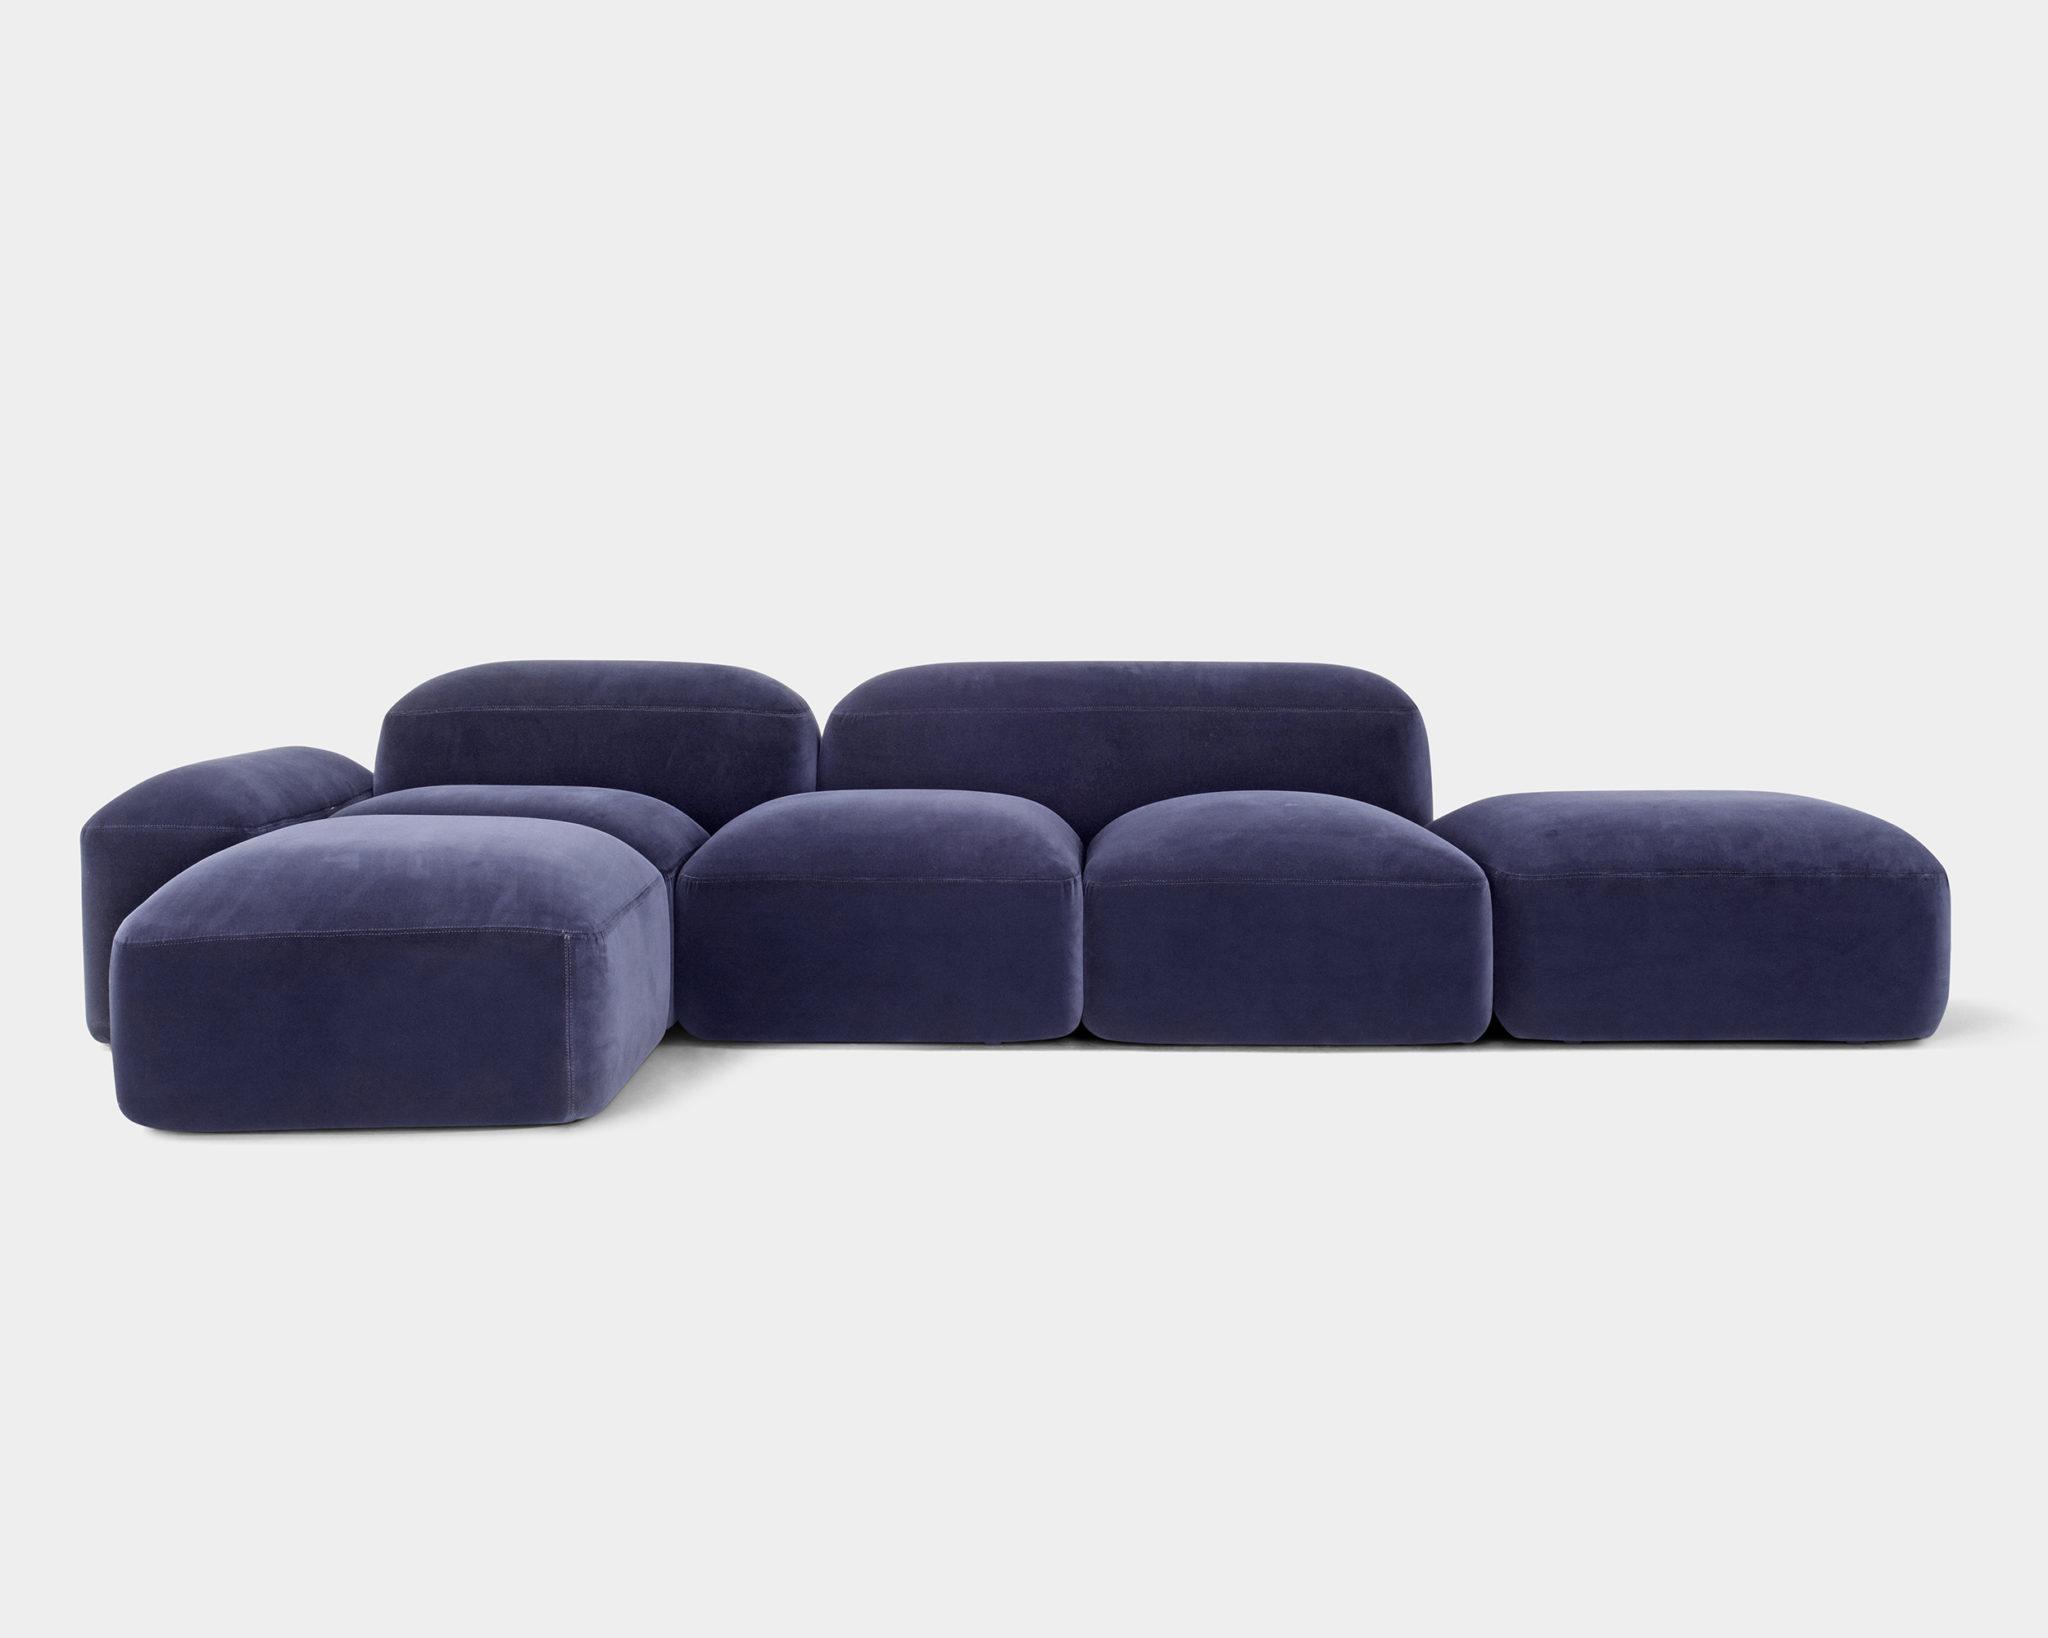 lapis-sofa-savannah-bay-gallery